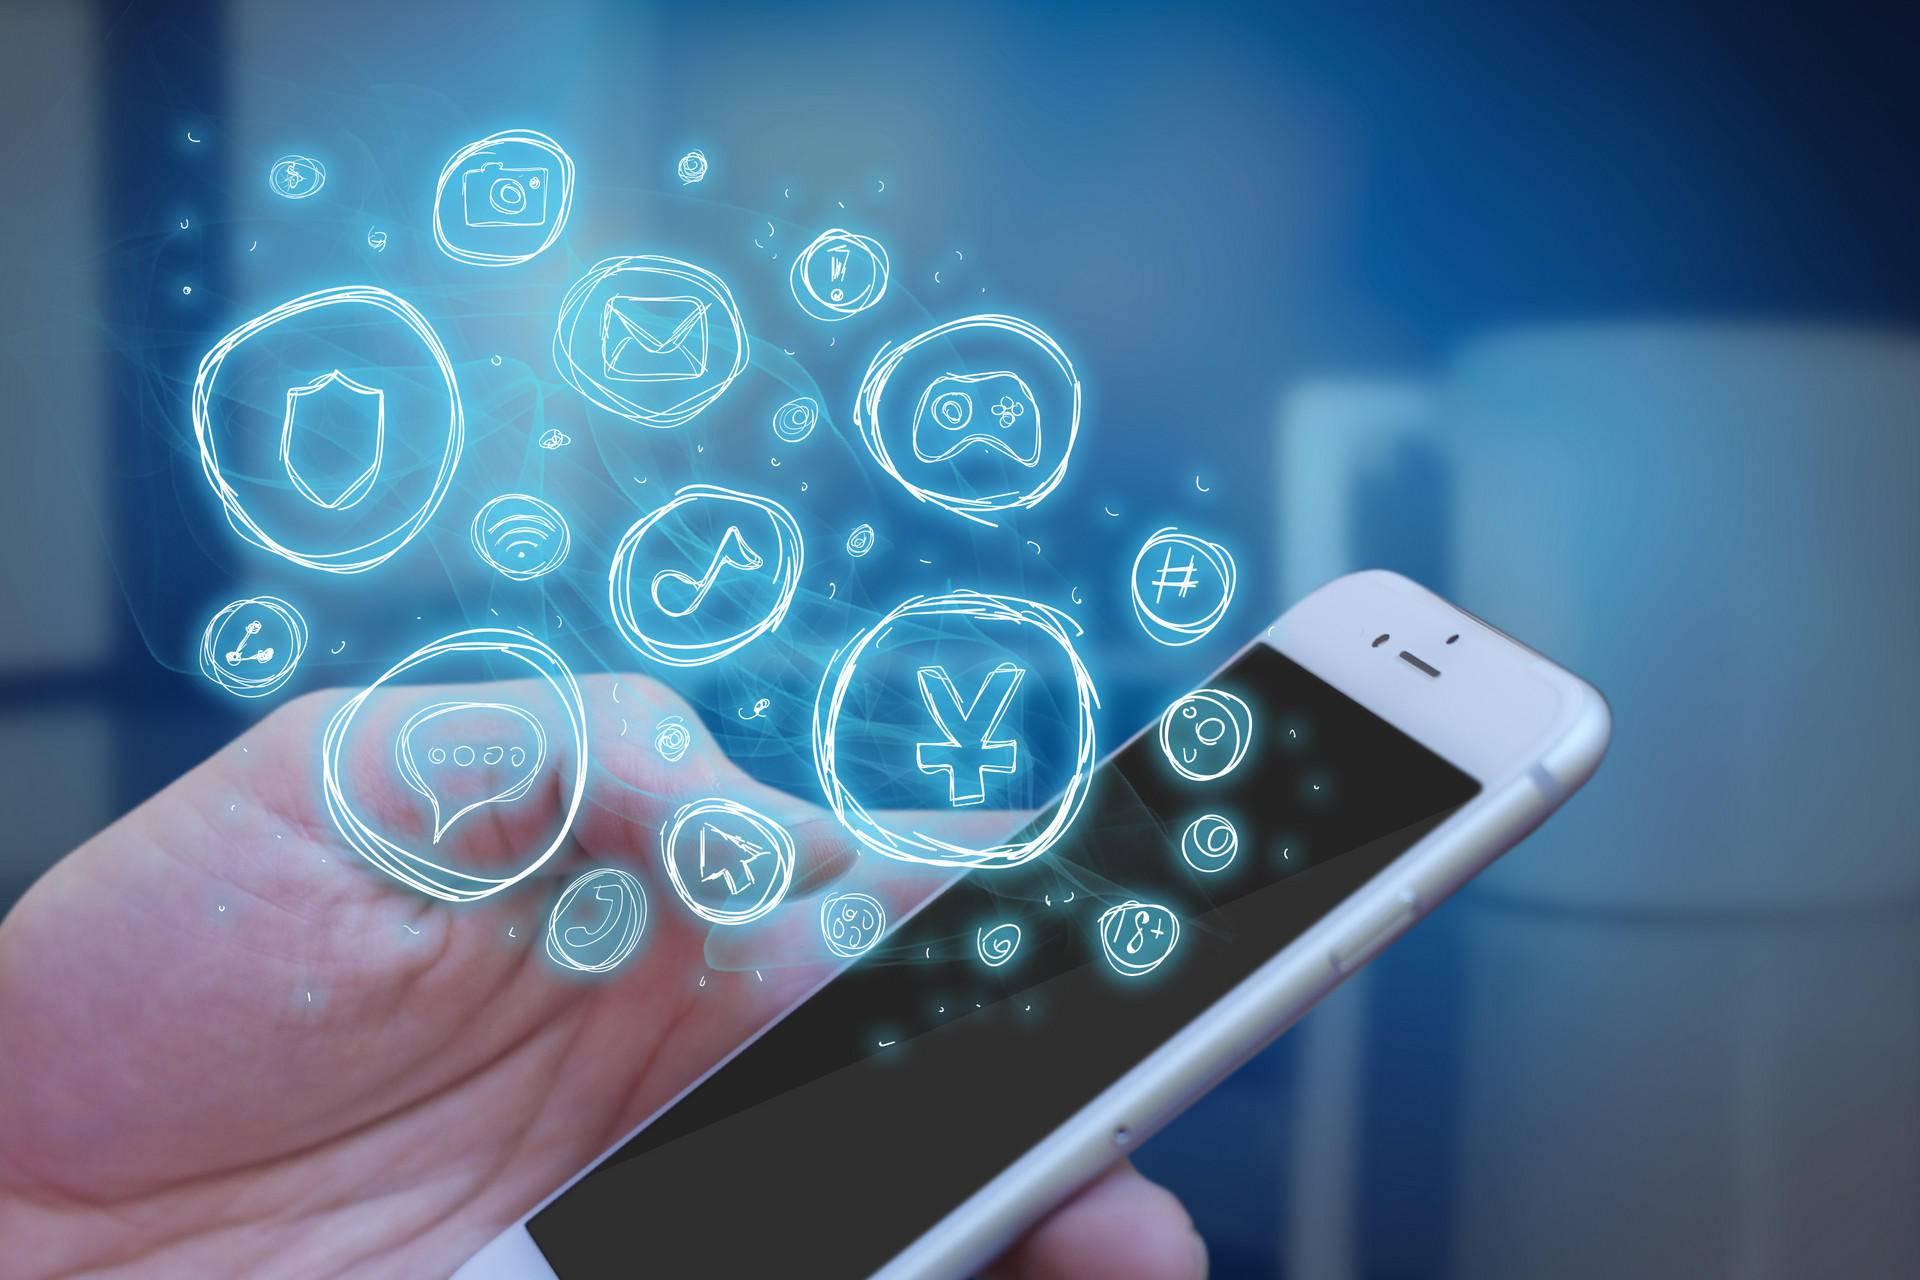 5G时代来了?一加明年将发布欧洲首款商用5G手机